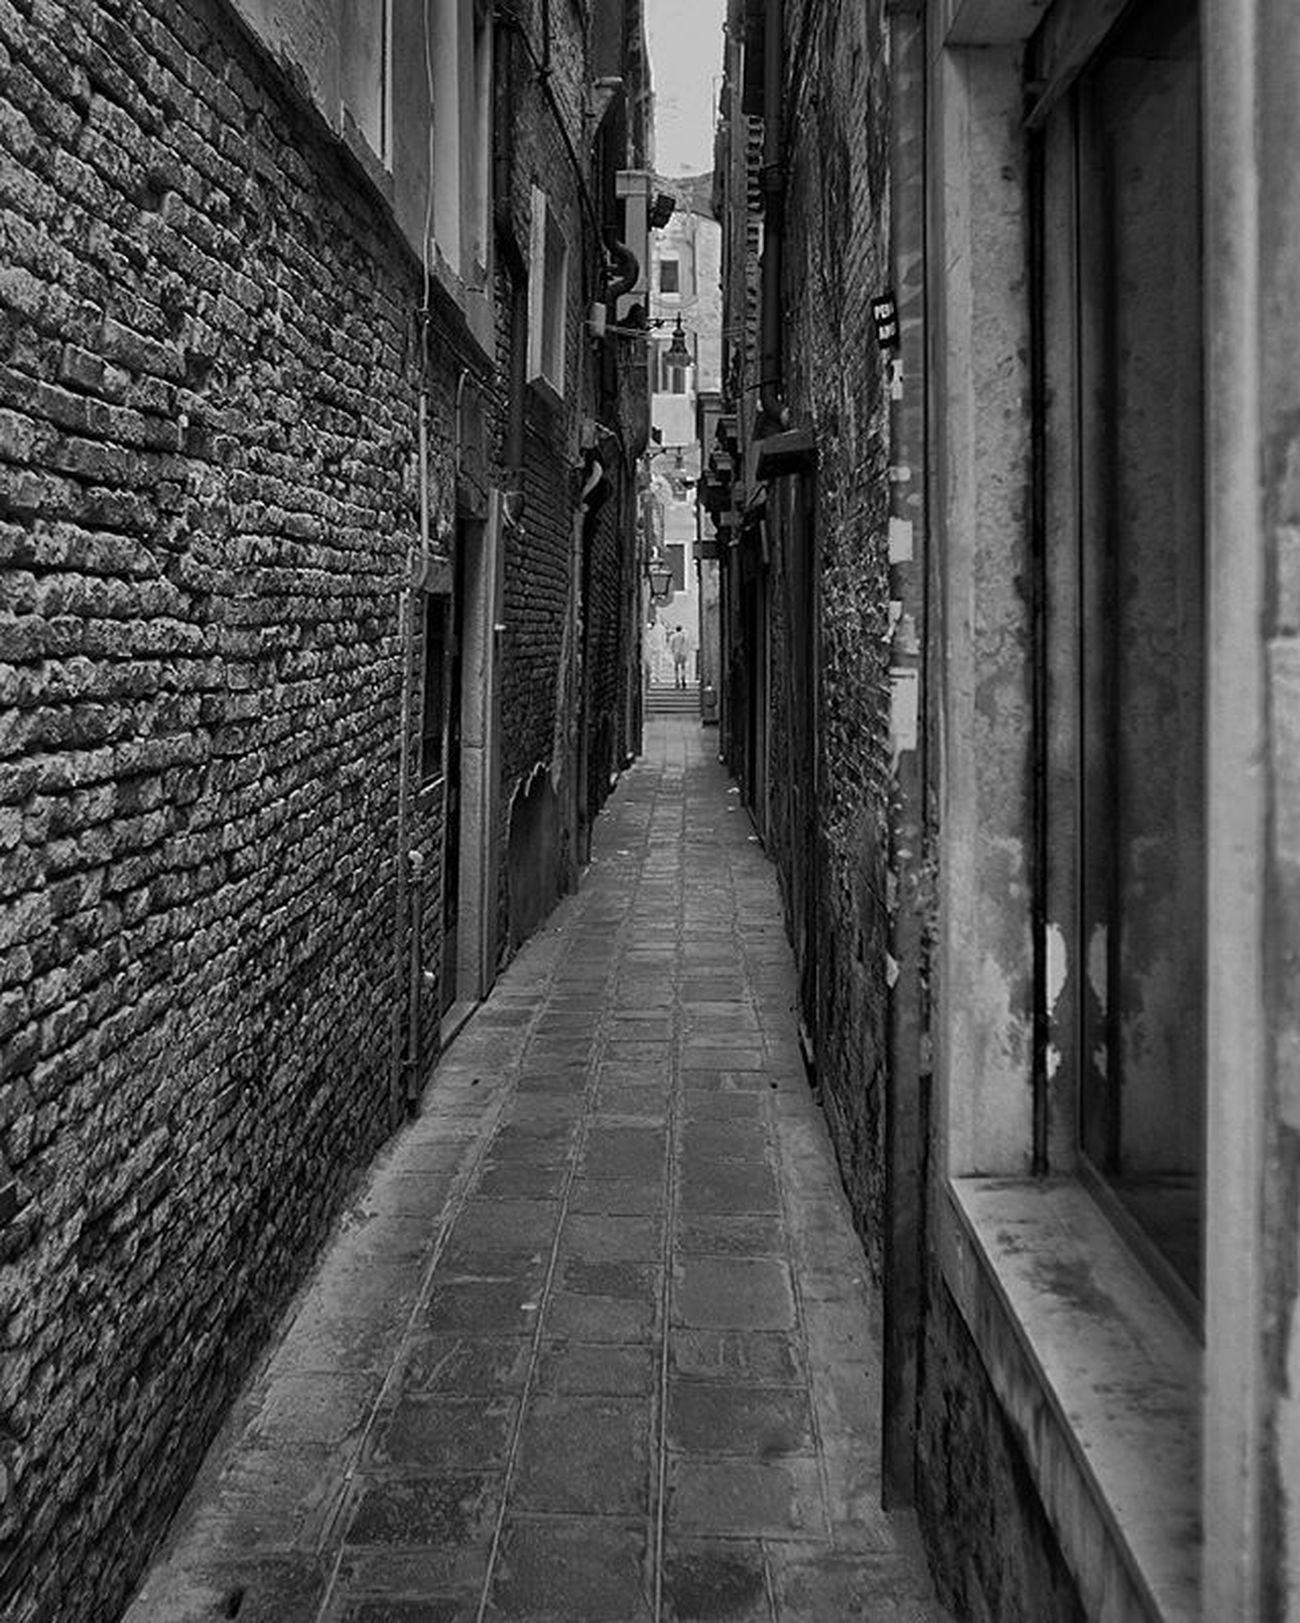 Grammasters3 Bw Blackandwhite Noiretblanc Streetphotography Rsa_bw Bnw_demand Mafia_bnwlove Siyahbeyaz Youmobile Wearegrryo Outofthephone Tinycollective Streetphotographers Gspc Hikaricreative Hartcollective Thesmartview Streetdreamsmag Streetscenesmagazine Commcam Ig_italy Igersitalia Igersitaly Italy